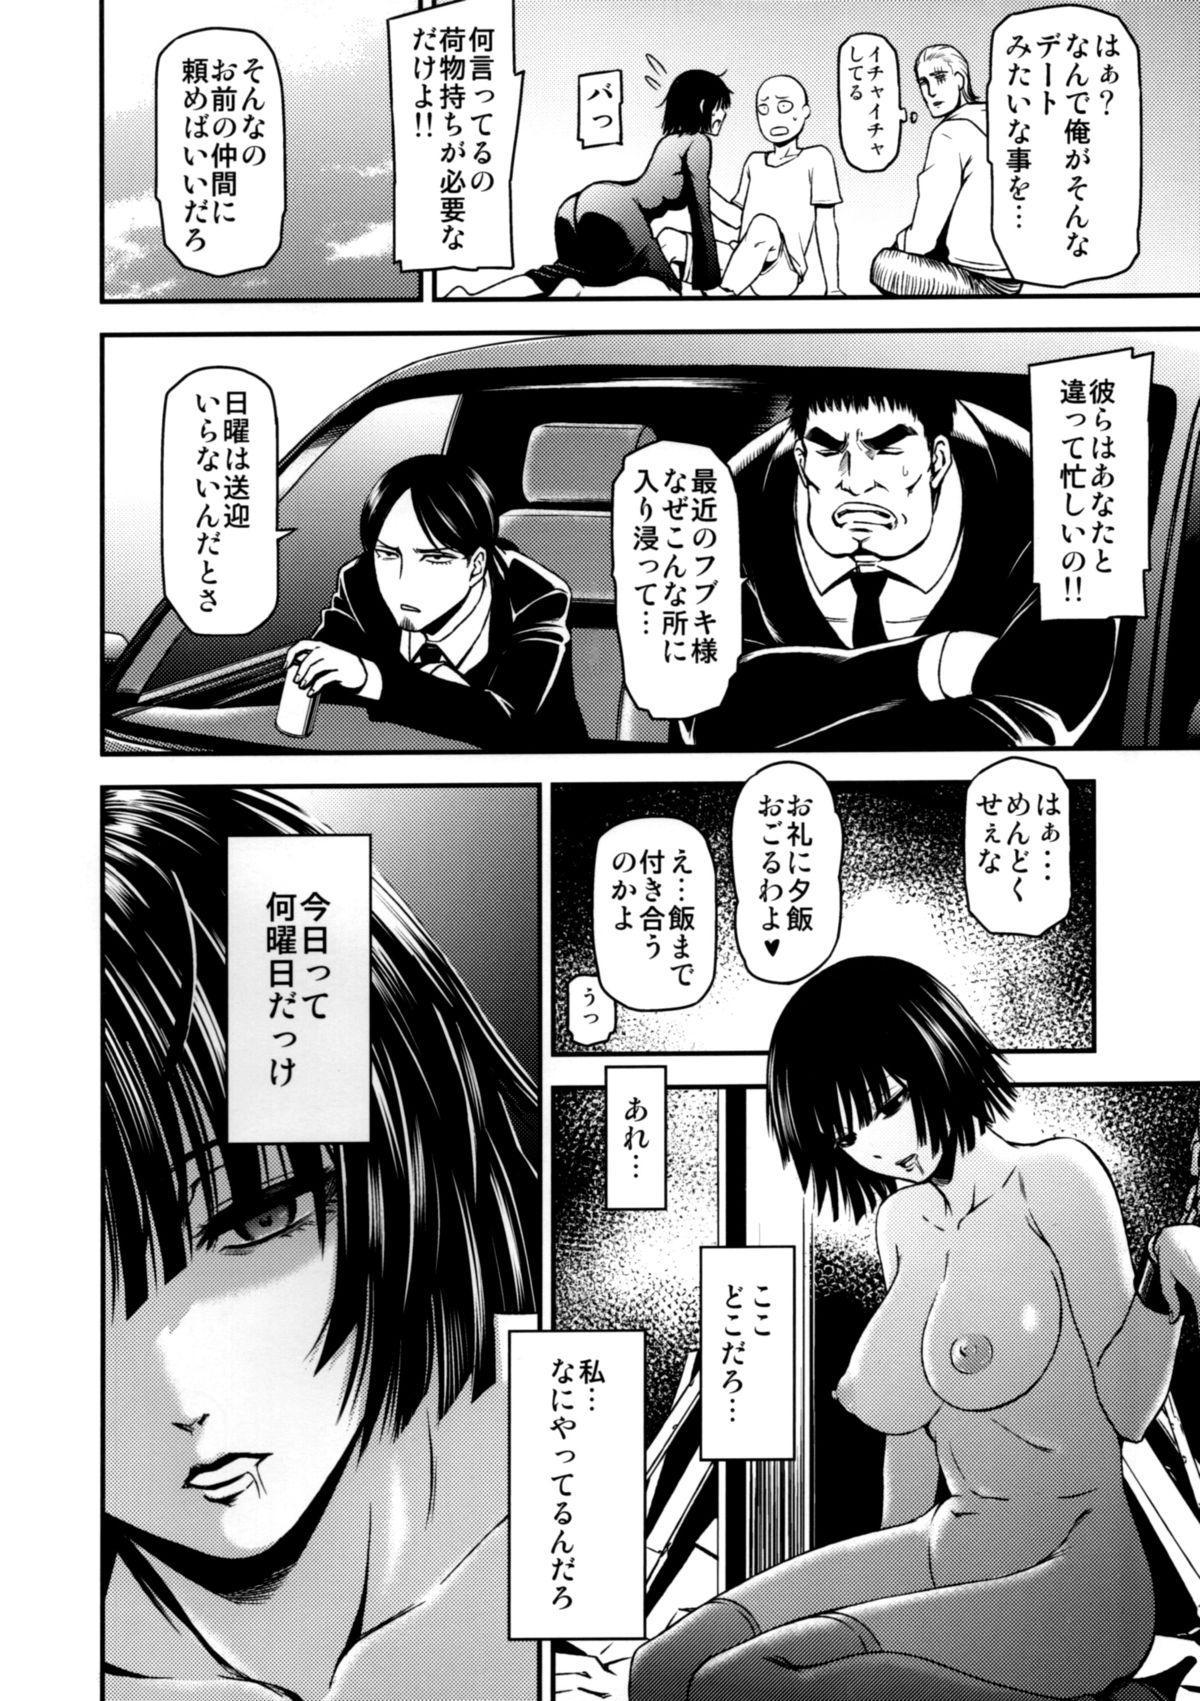 (C89) [Kiyosumi Hurricane (Kiyosumi Hurricane)] ONE-HURRICANE - Kutsujoku no Tatsumaki (One Punch Man) 2